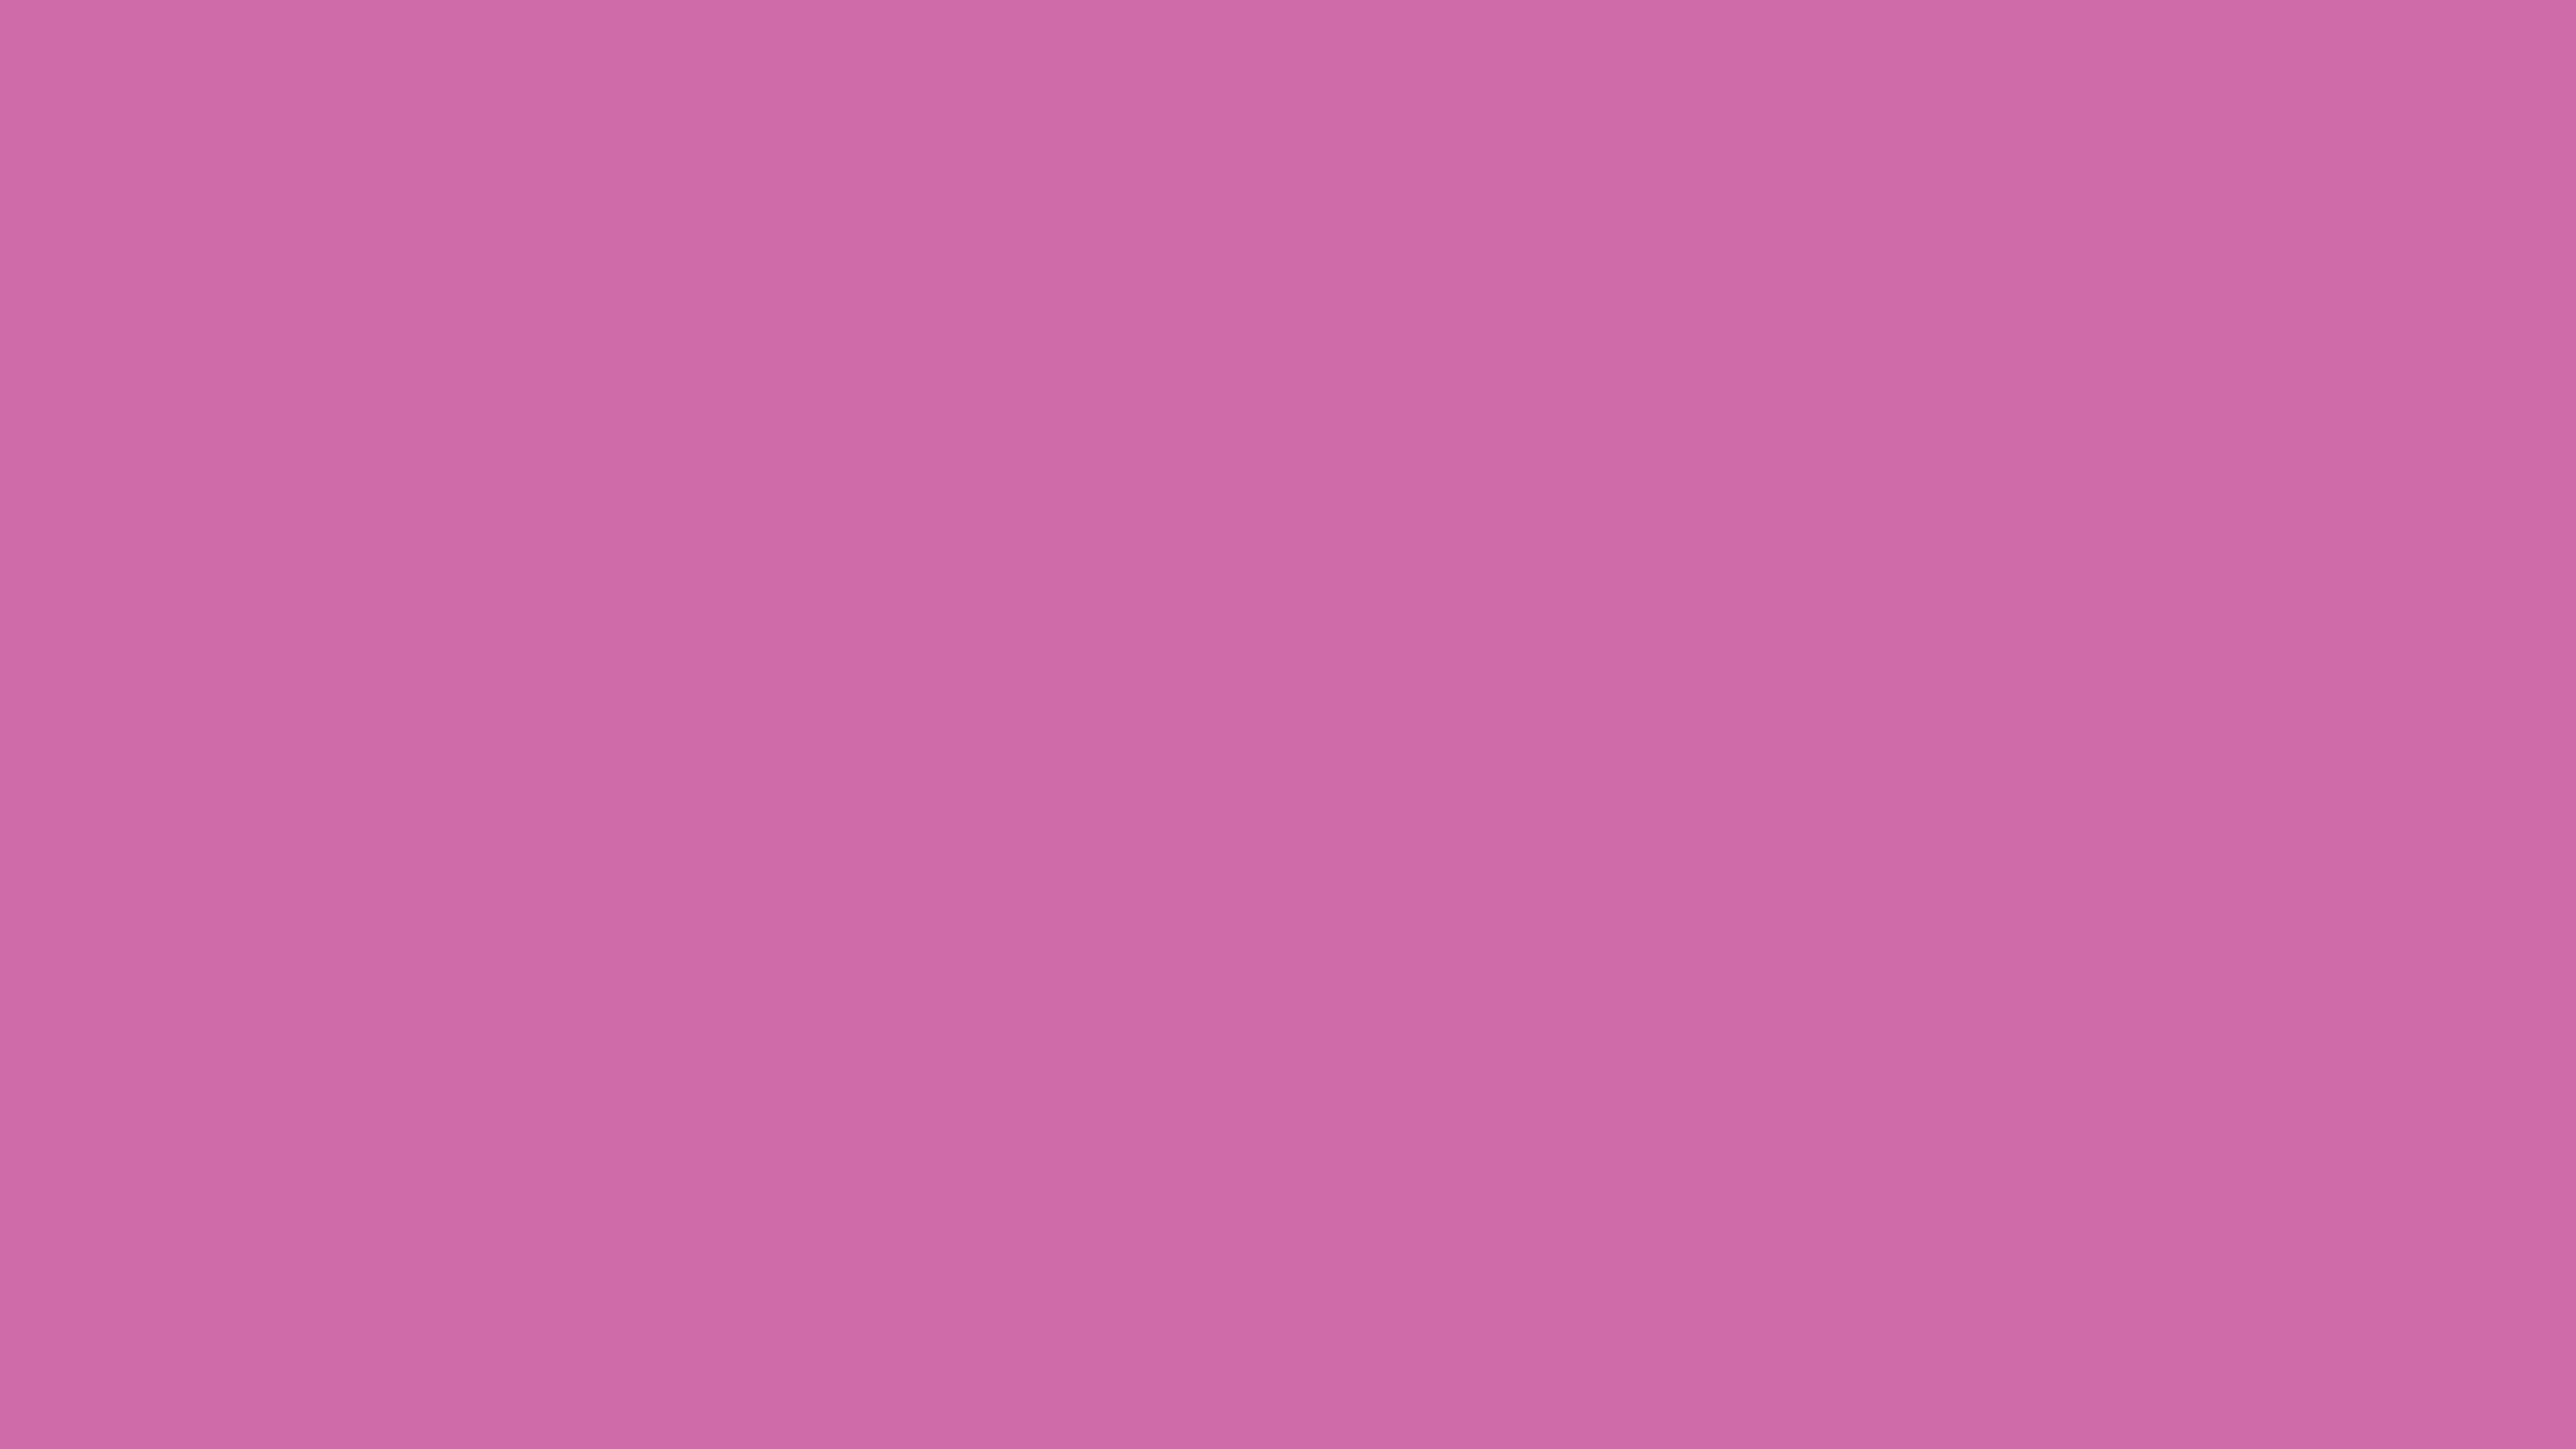 5120x2880 Super Pink Solid Color Background